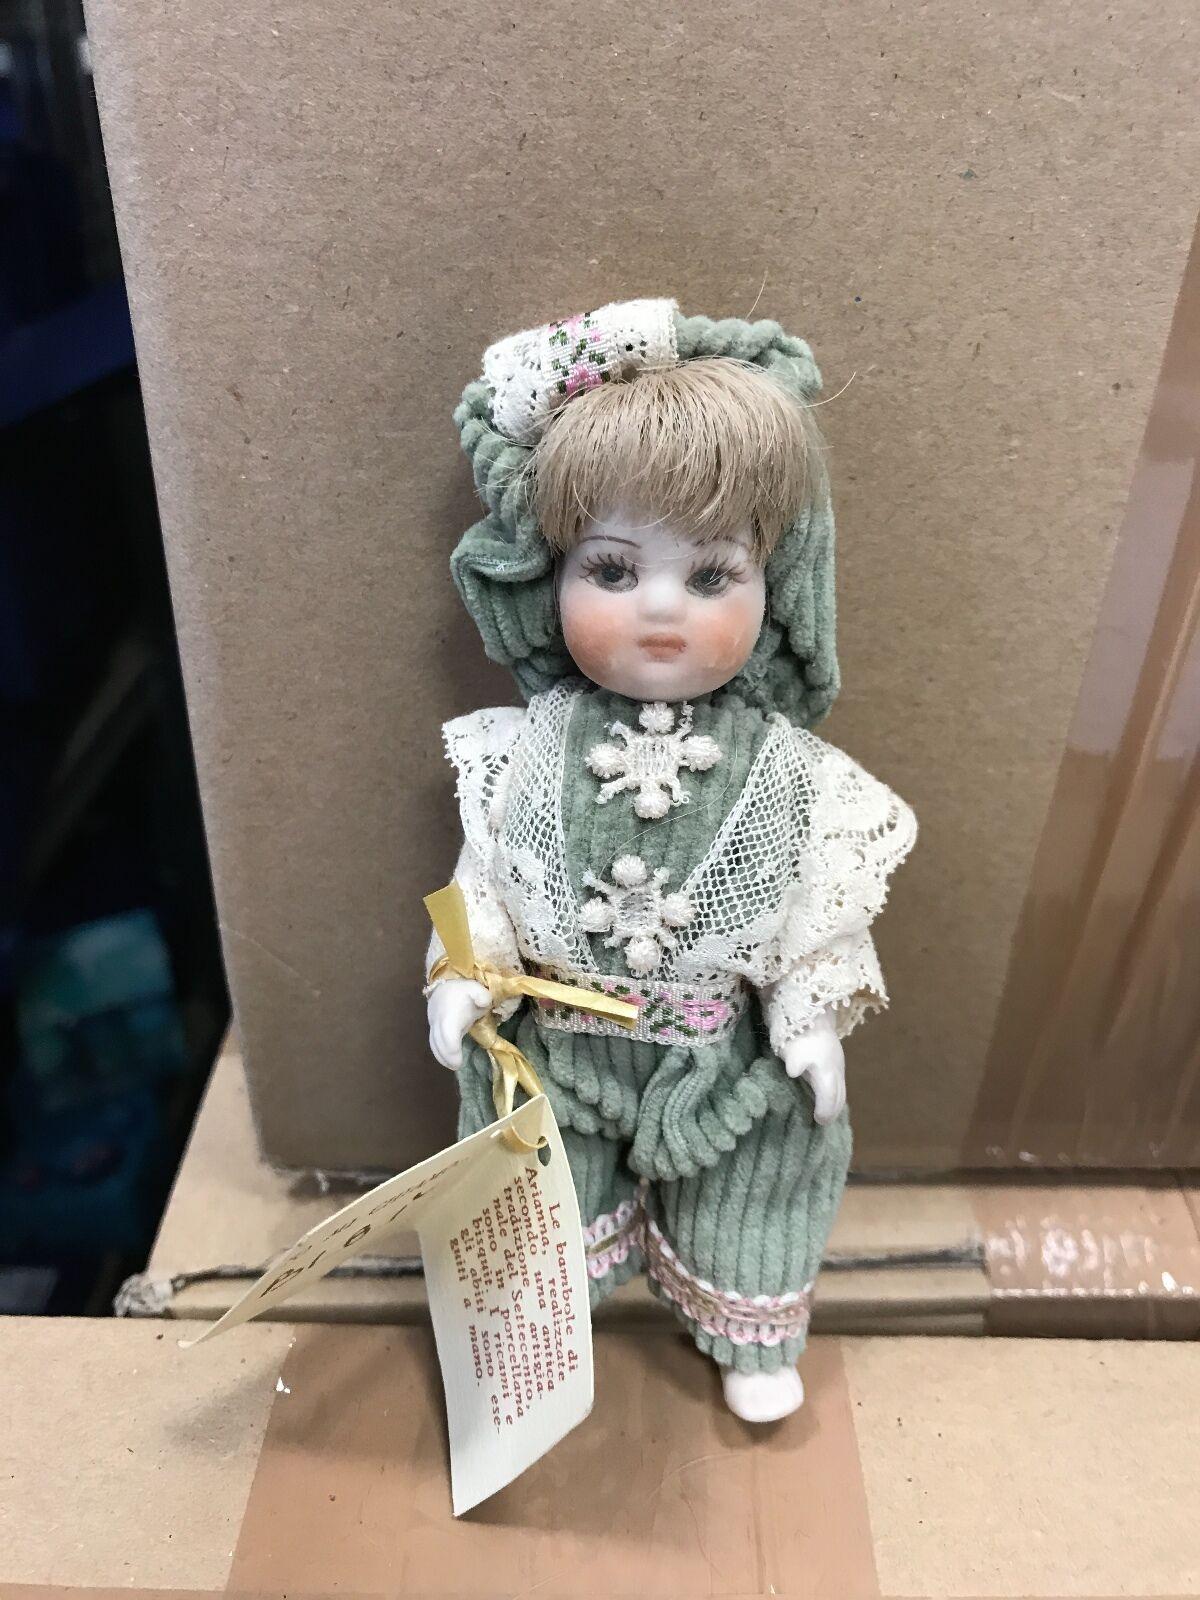 Artistas muñeca muñeca de porcelana 11,5 cm. top estado